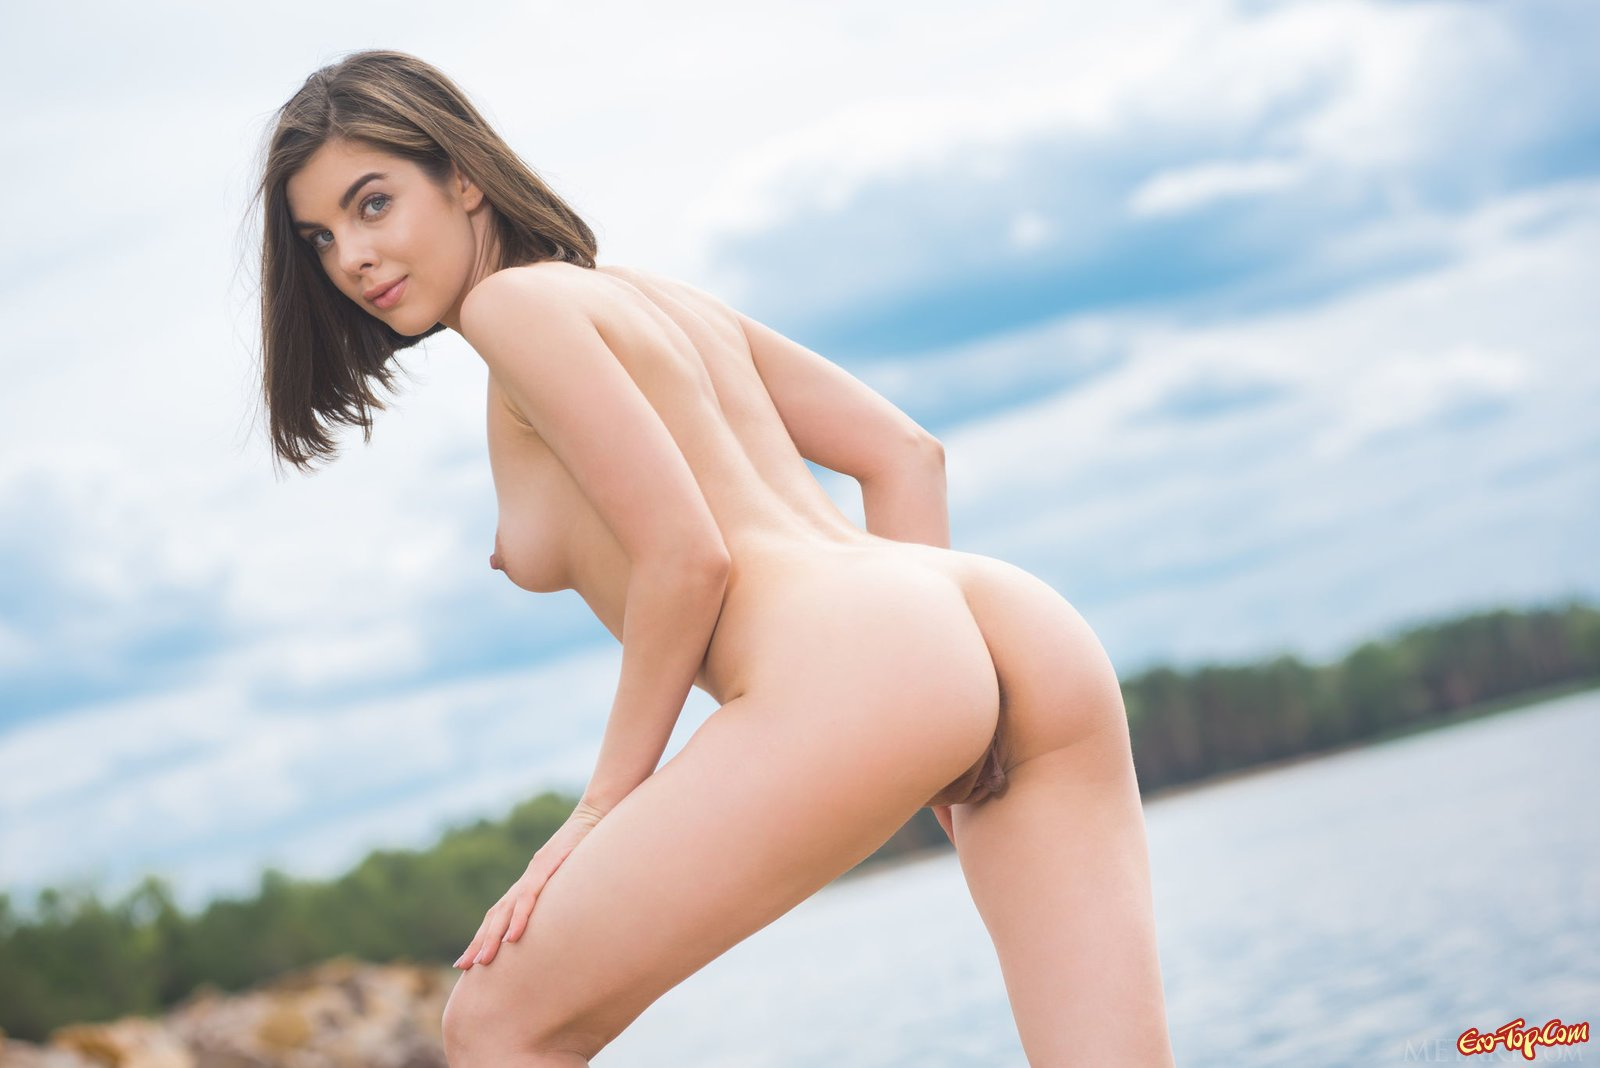 Сексуальная девушка голая гуляет на пляже